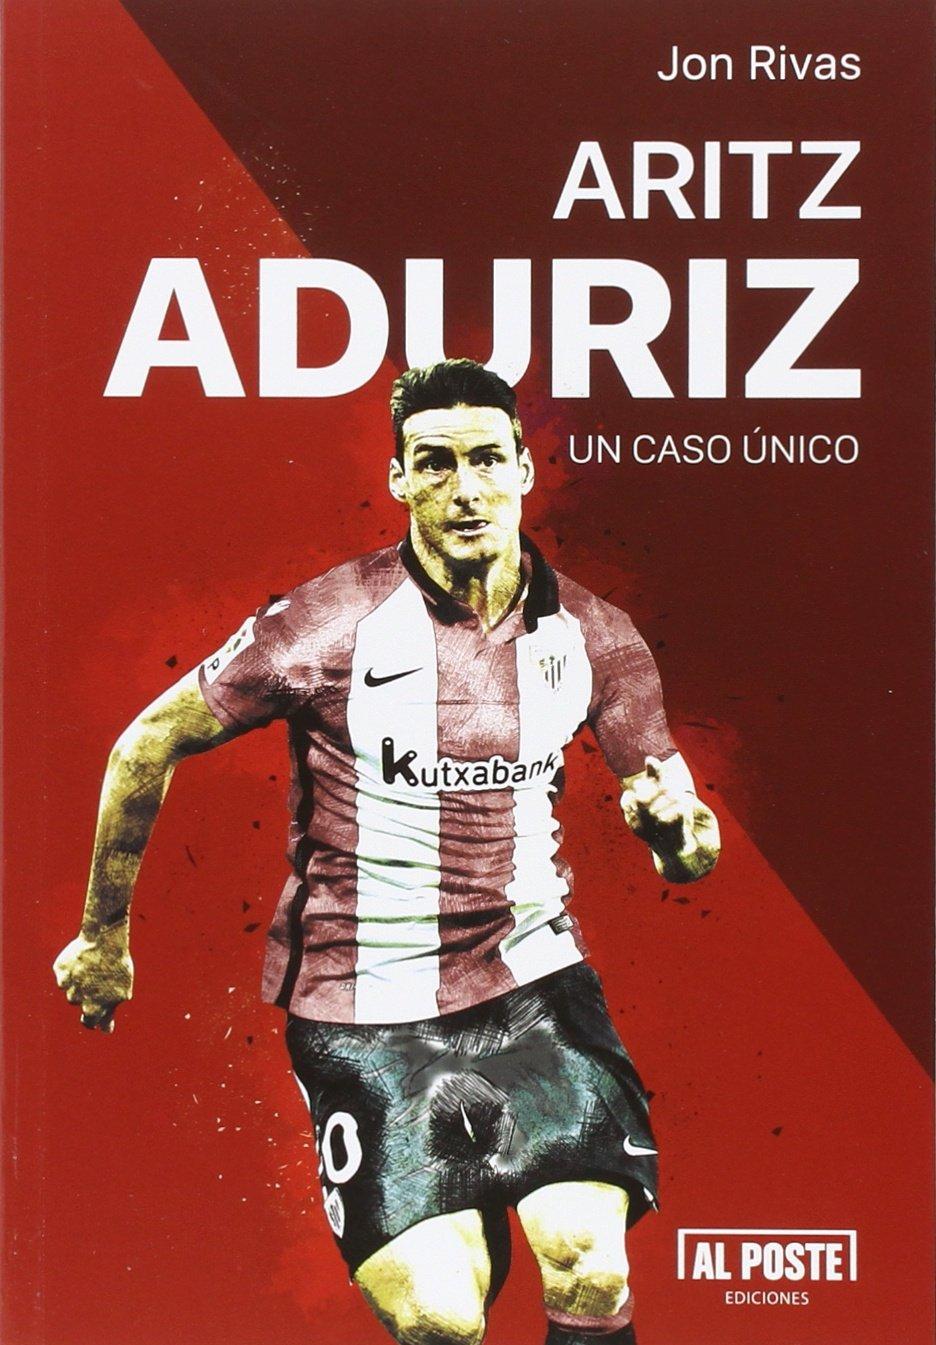 Aritz Aduriz Un Caso šnico Amazon Jon Rivas Albizu Libros